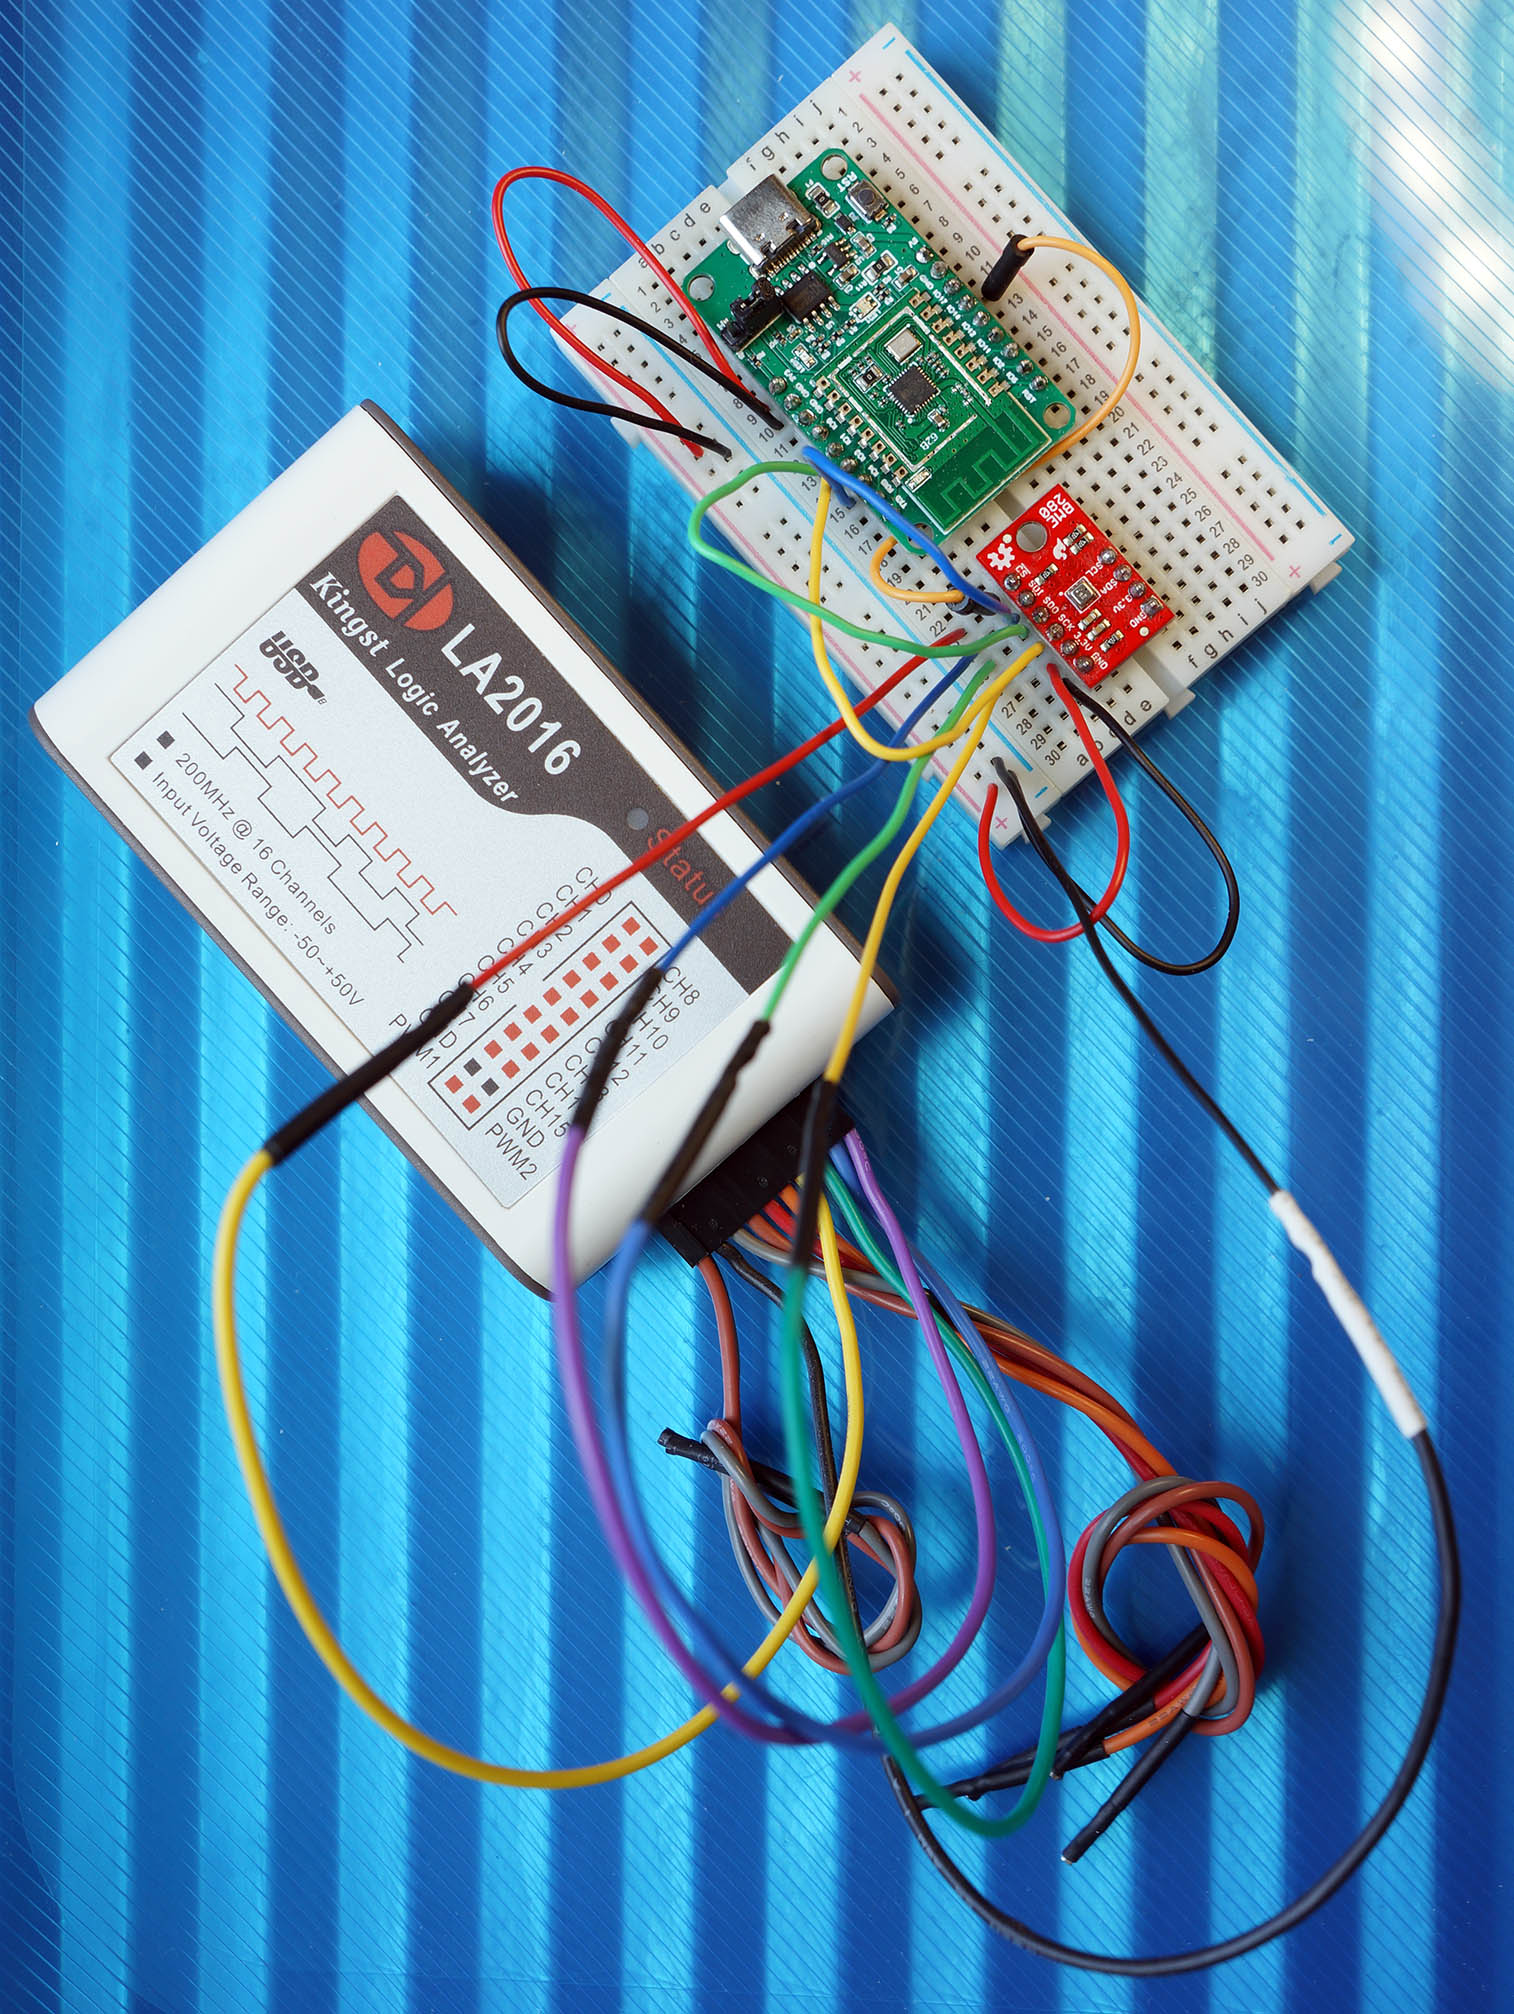 PineCone BL602 RISC-V Board connected to LA2016 Logic Analyser and BME280 SPI Sensor